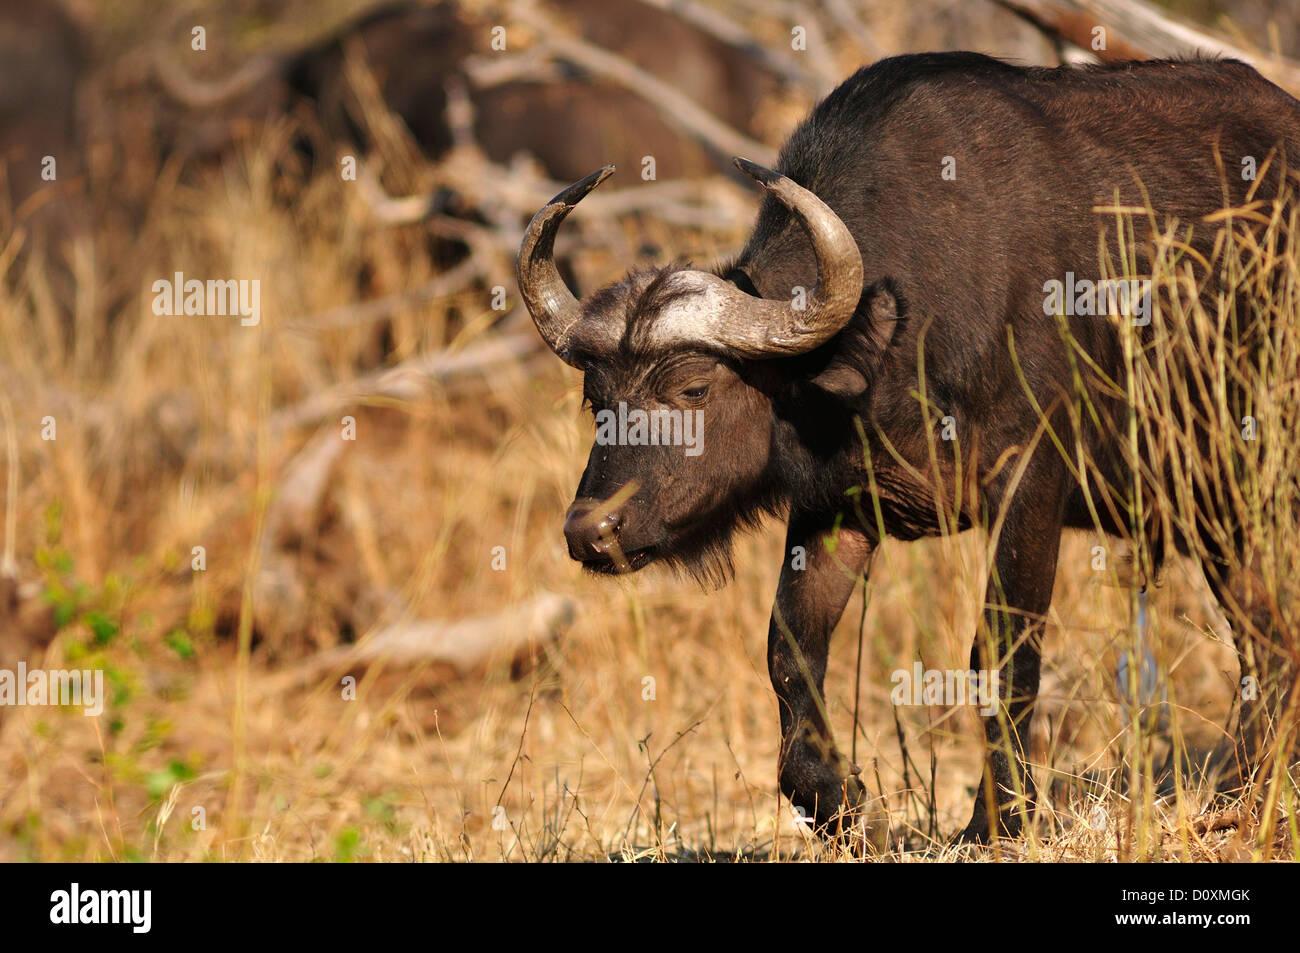 Africa, Botswana, Chobe, National Park, safari, horizontal, wildlife, Buffalo, animal, Syncerus caffer Stock Photo